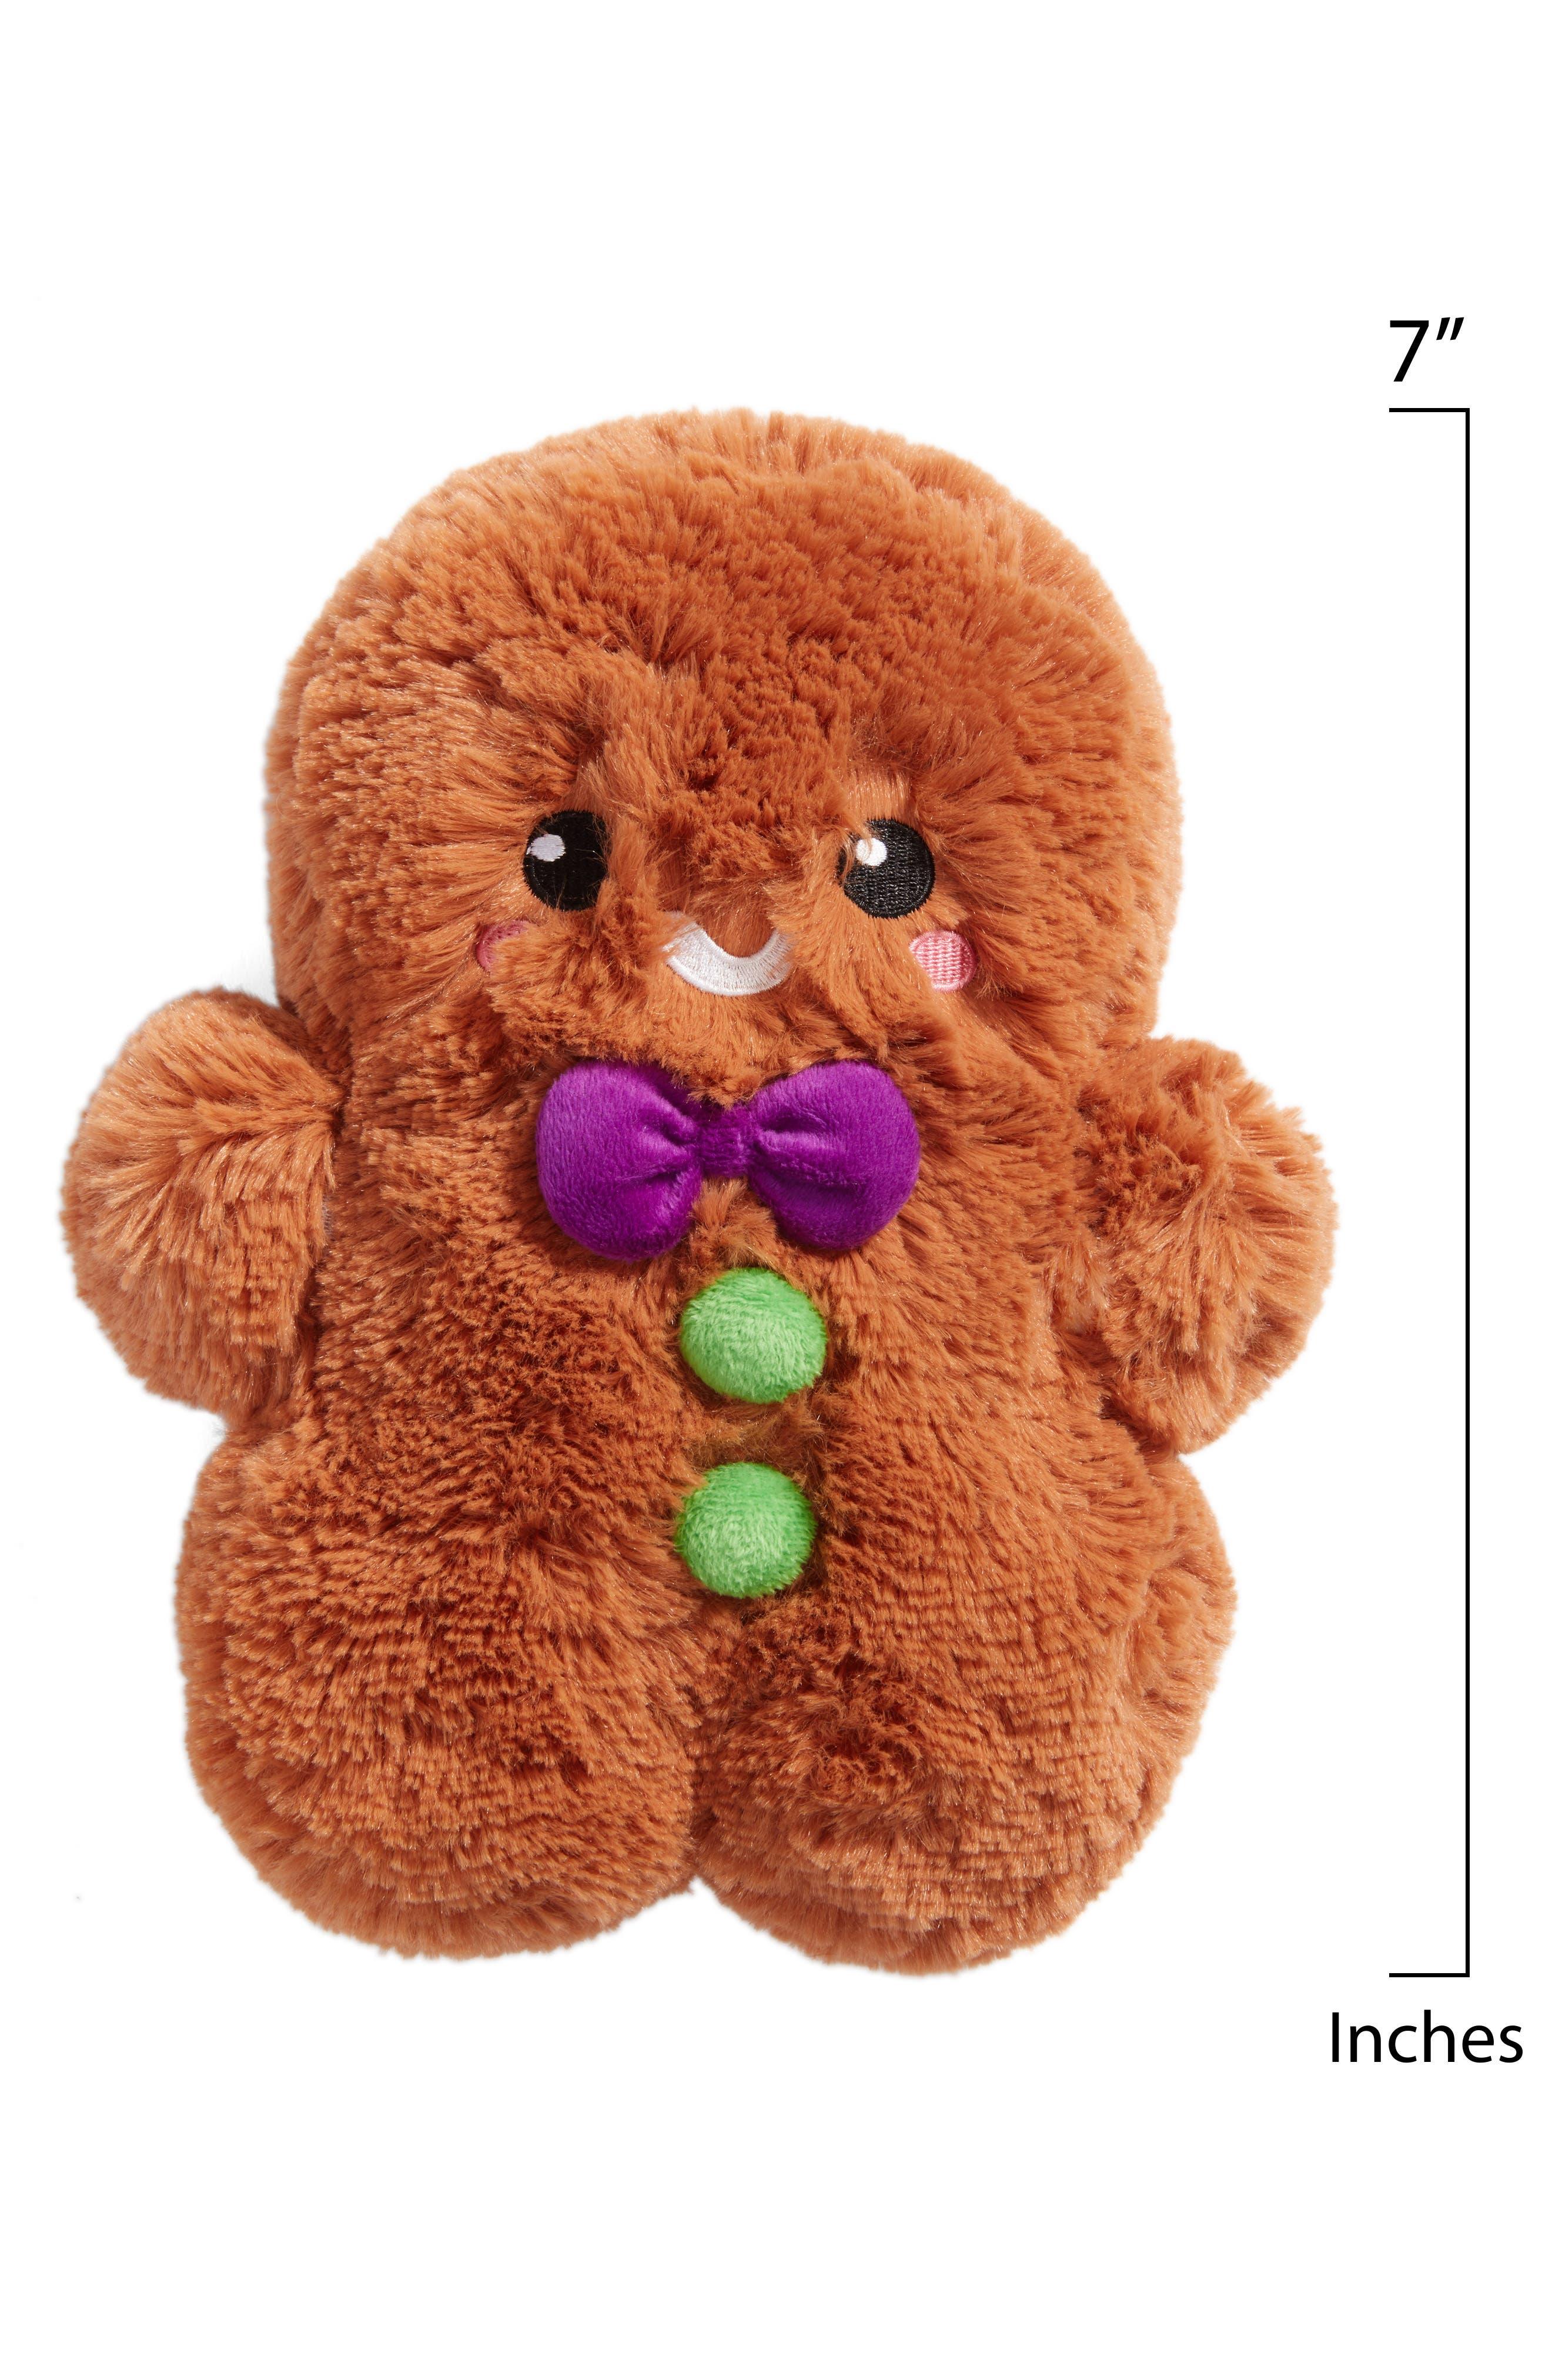 Mini Gingerbread Man Stuffed Toy,                             Alternate thumbnail 2, color,                             200